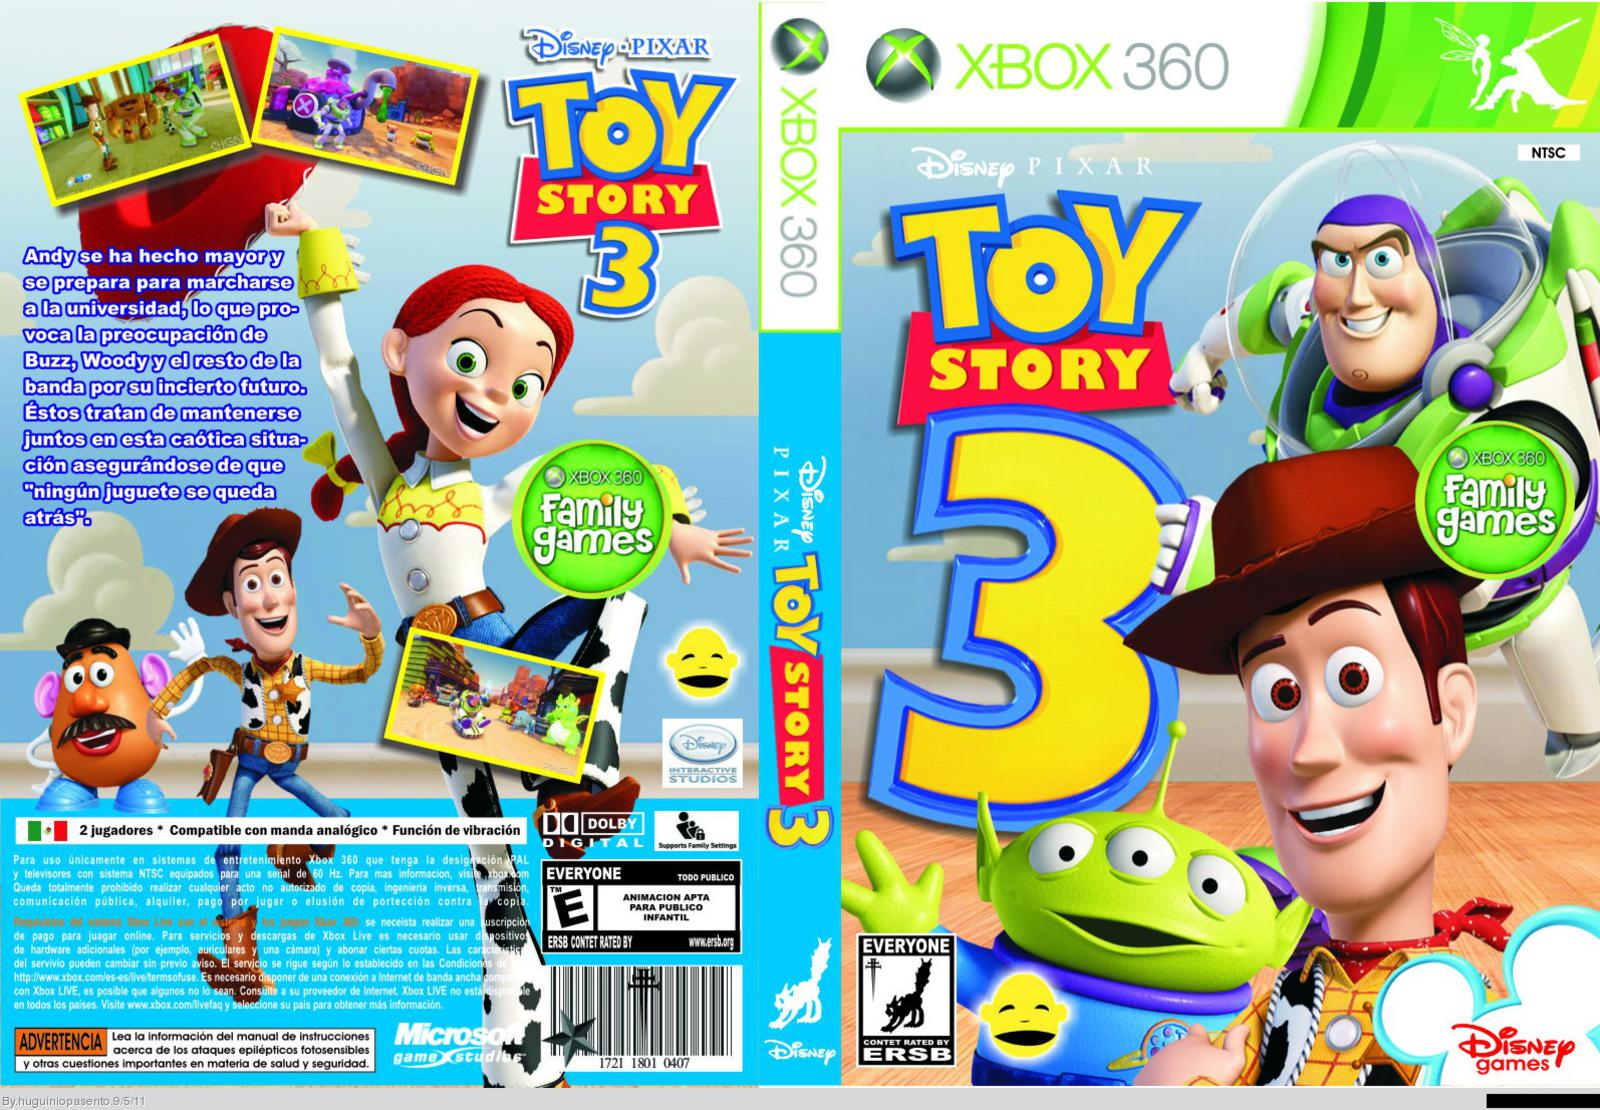 Verdugo Online Toy Story 3 - [ XBOX-360 ] [RF] [GuruFuel] Download Torrent